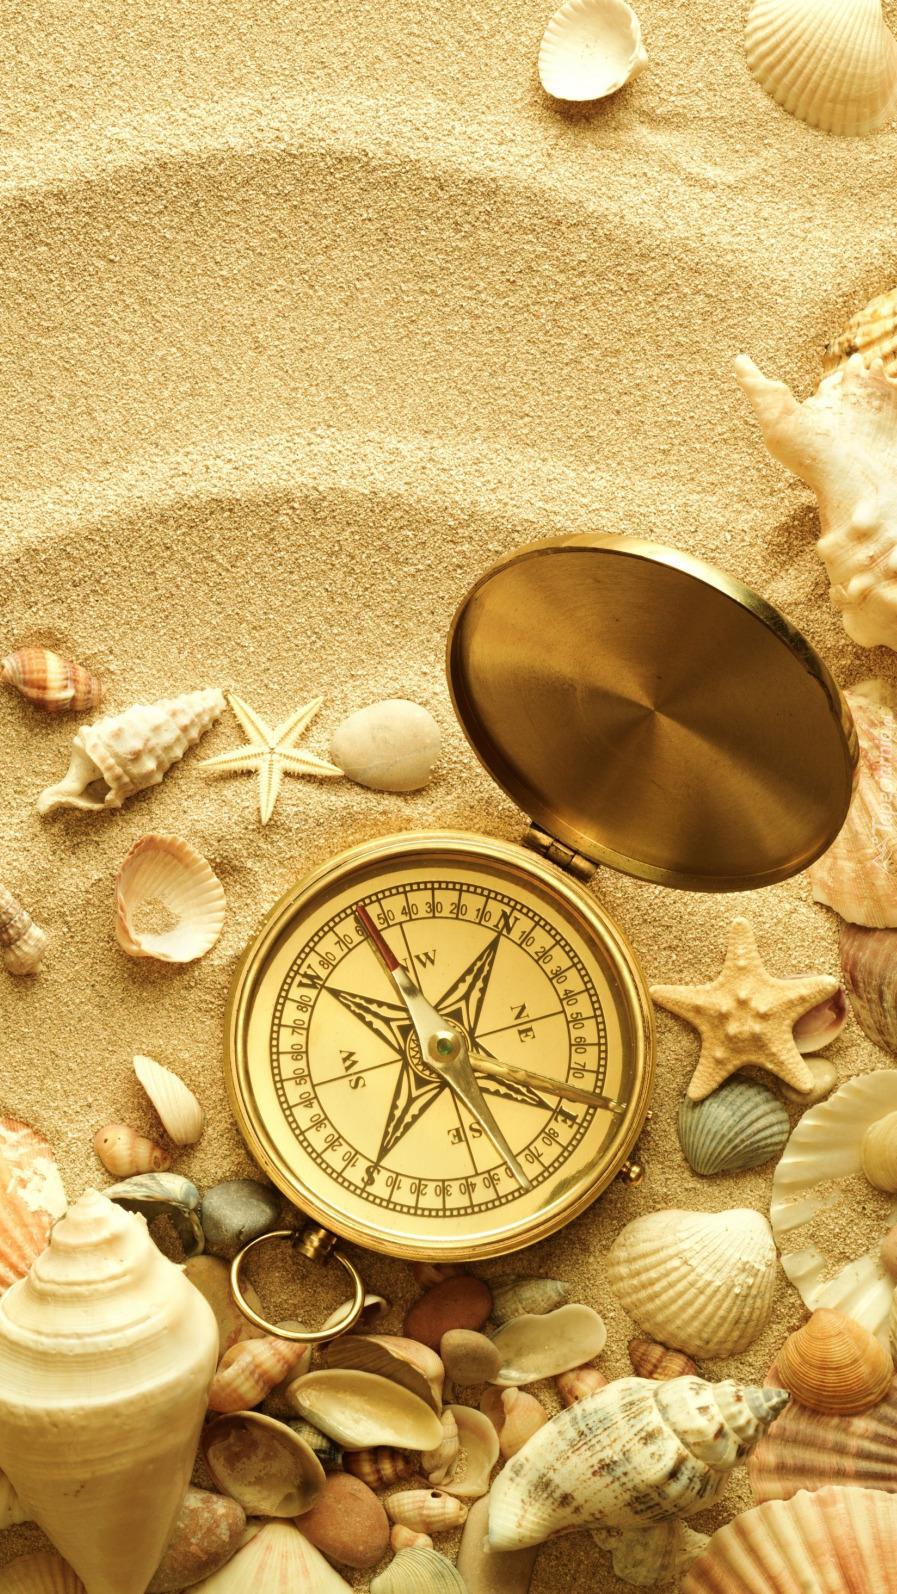 Kompas i muszelki na piasku